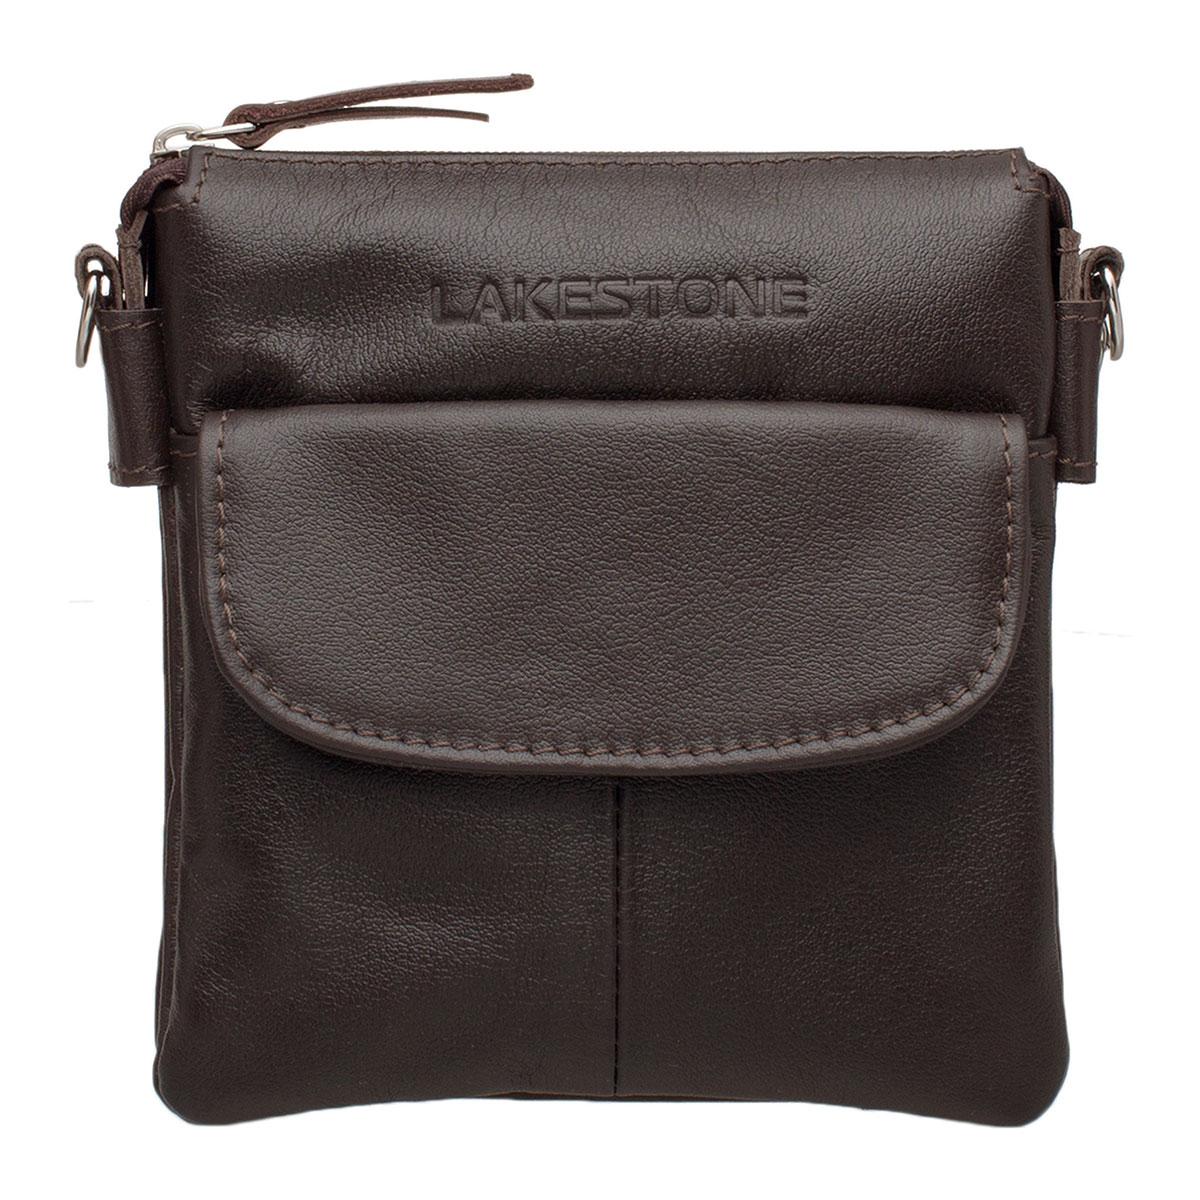 "Сумка ""Lakestone"" Osborne Brown от Lakestone"